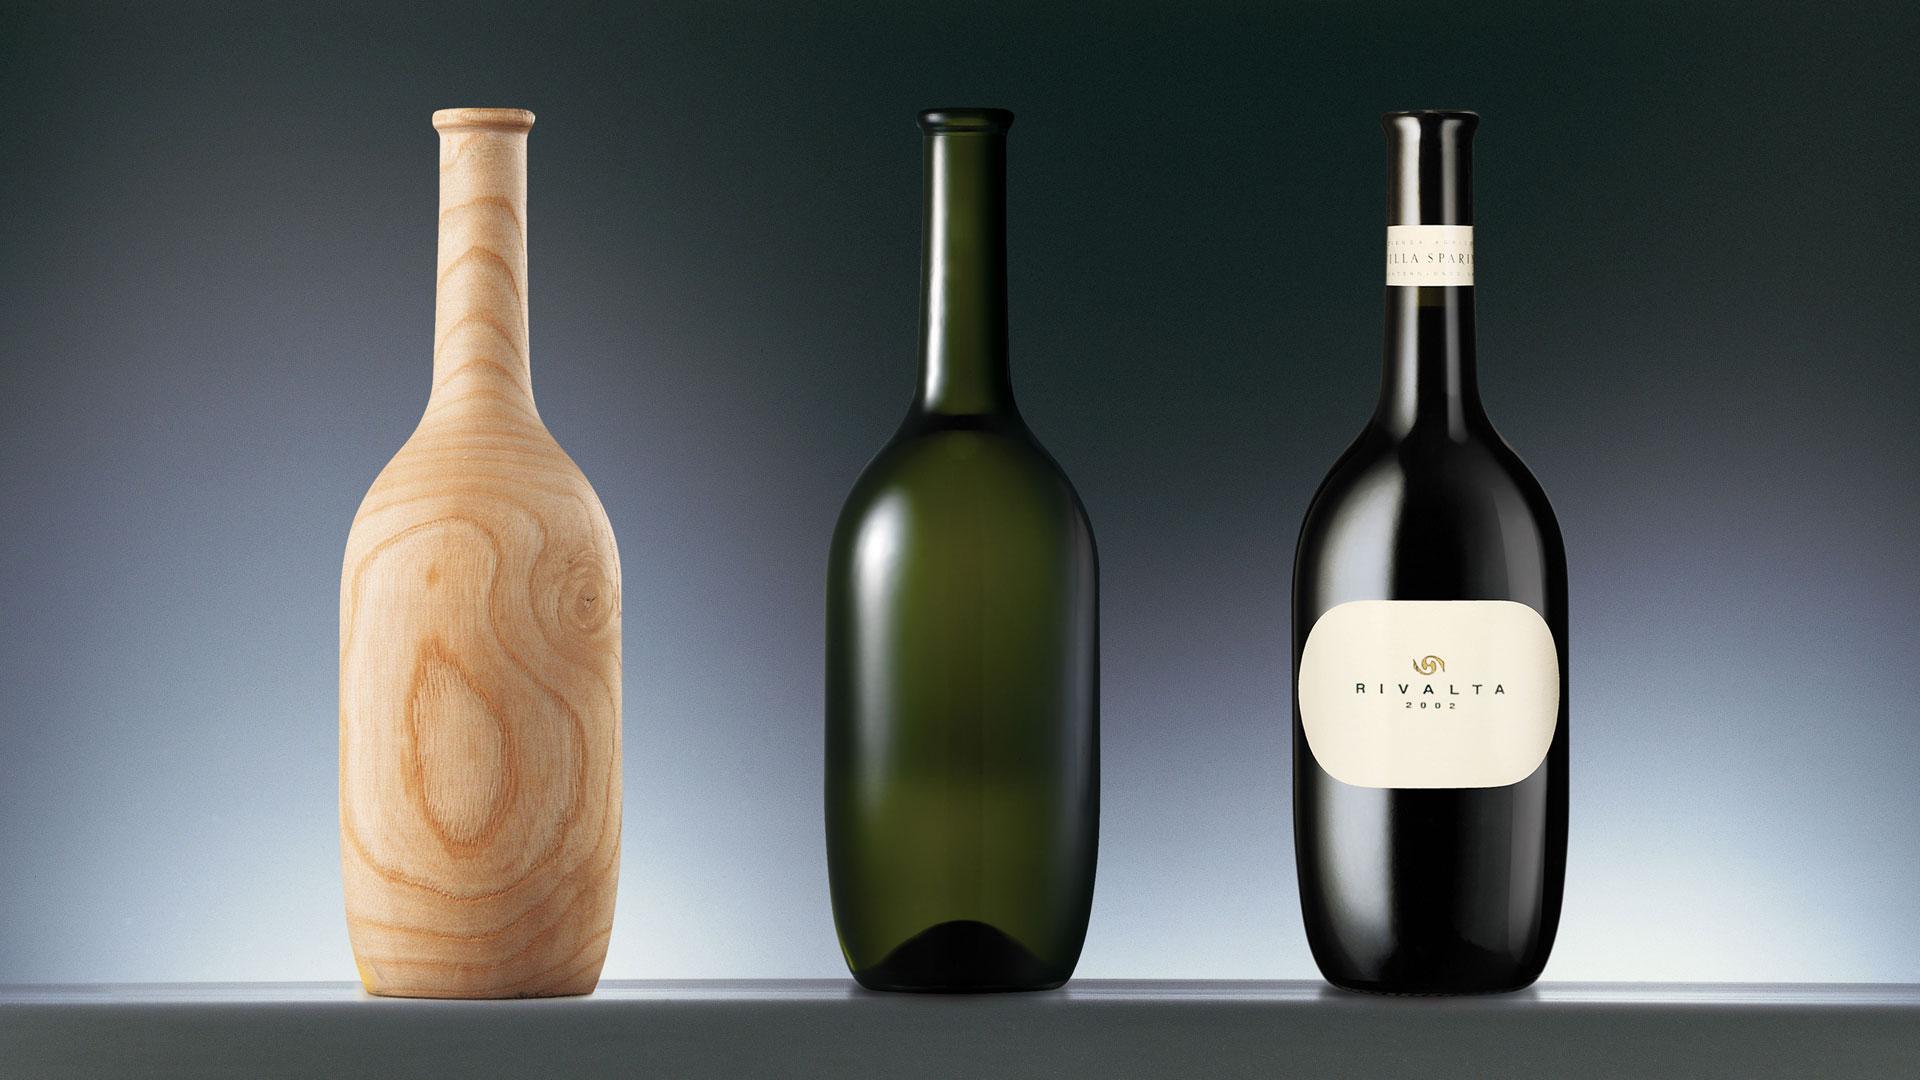 Villa Sparina bottle design